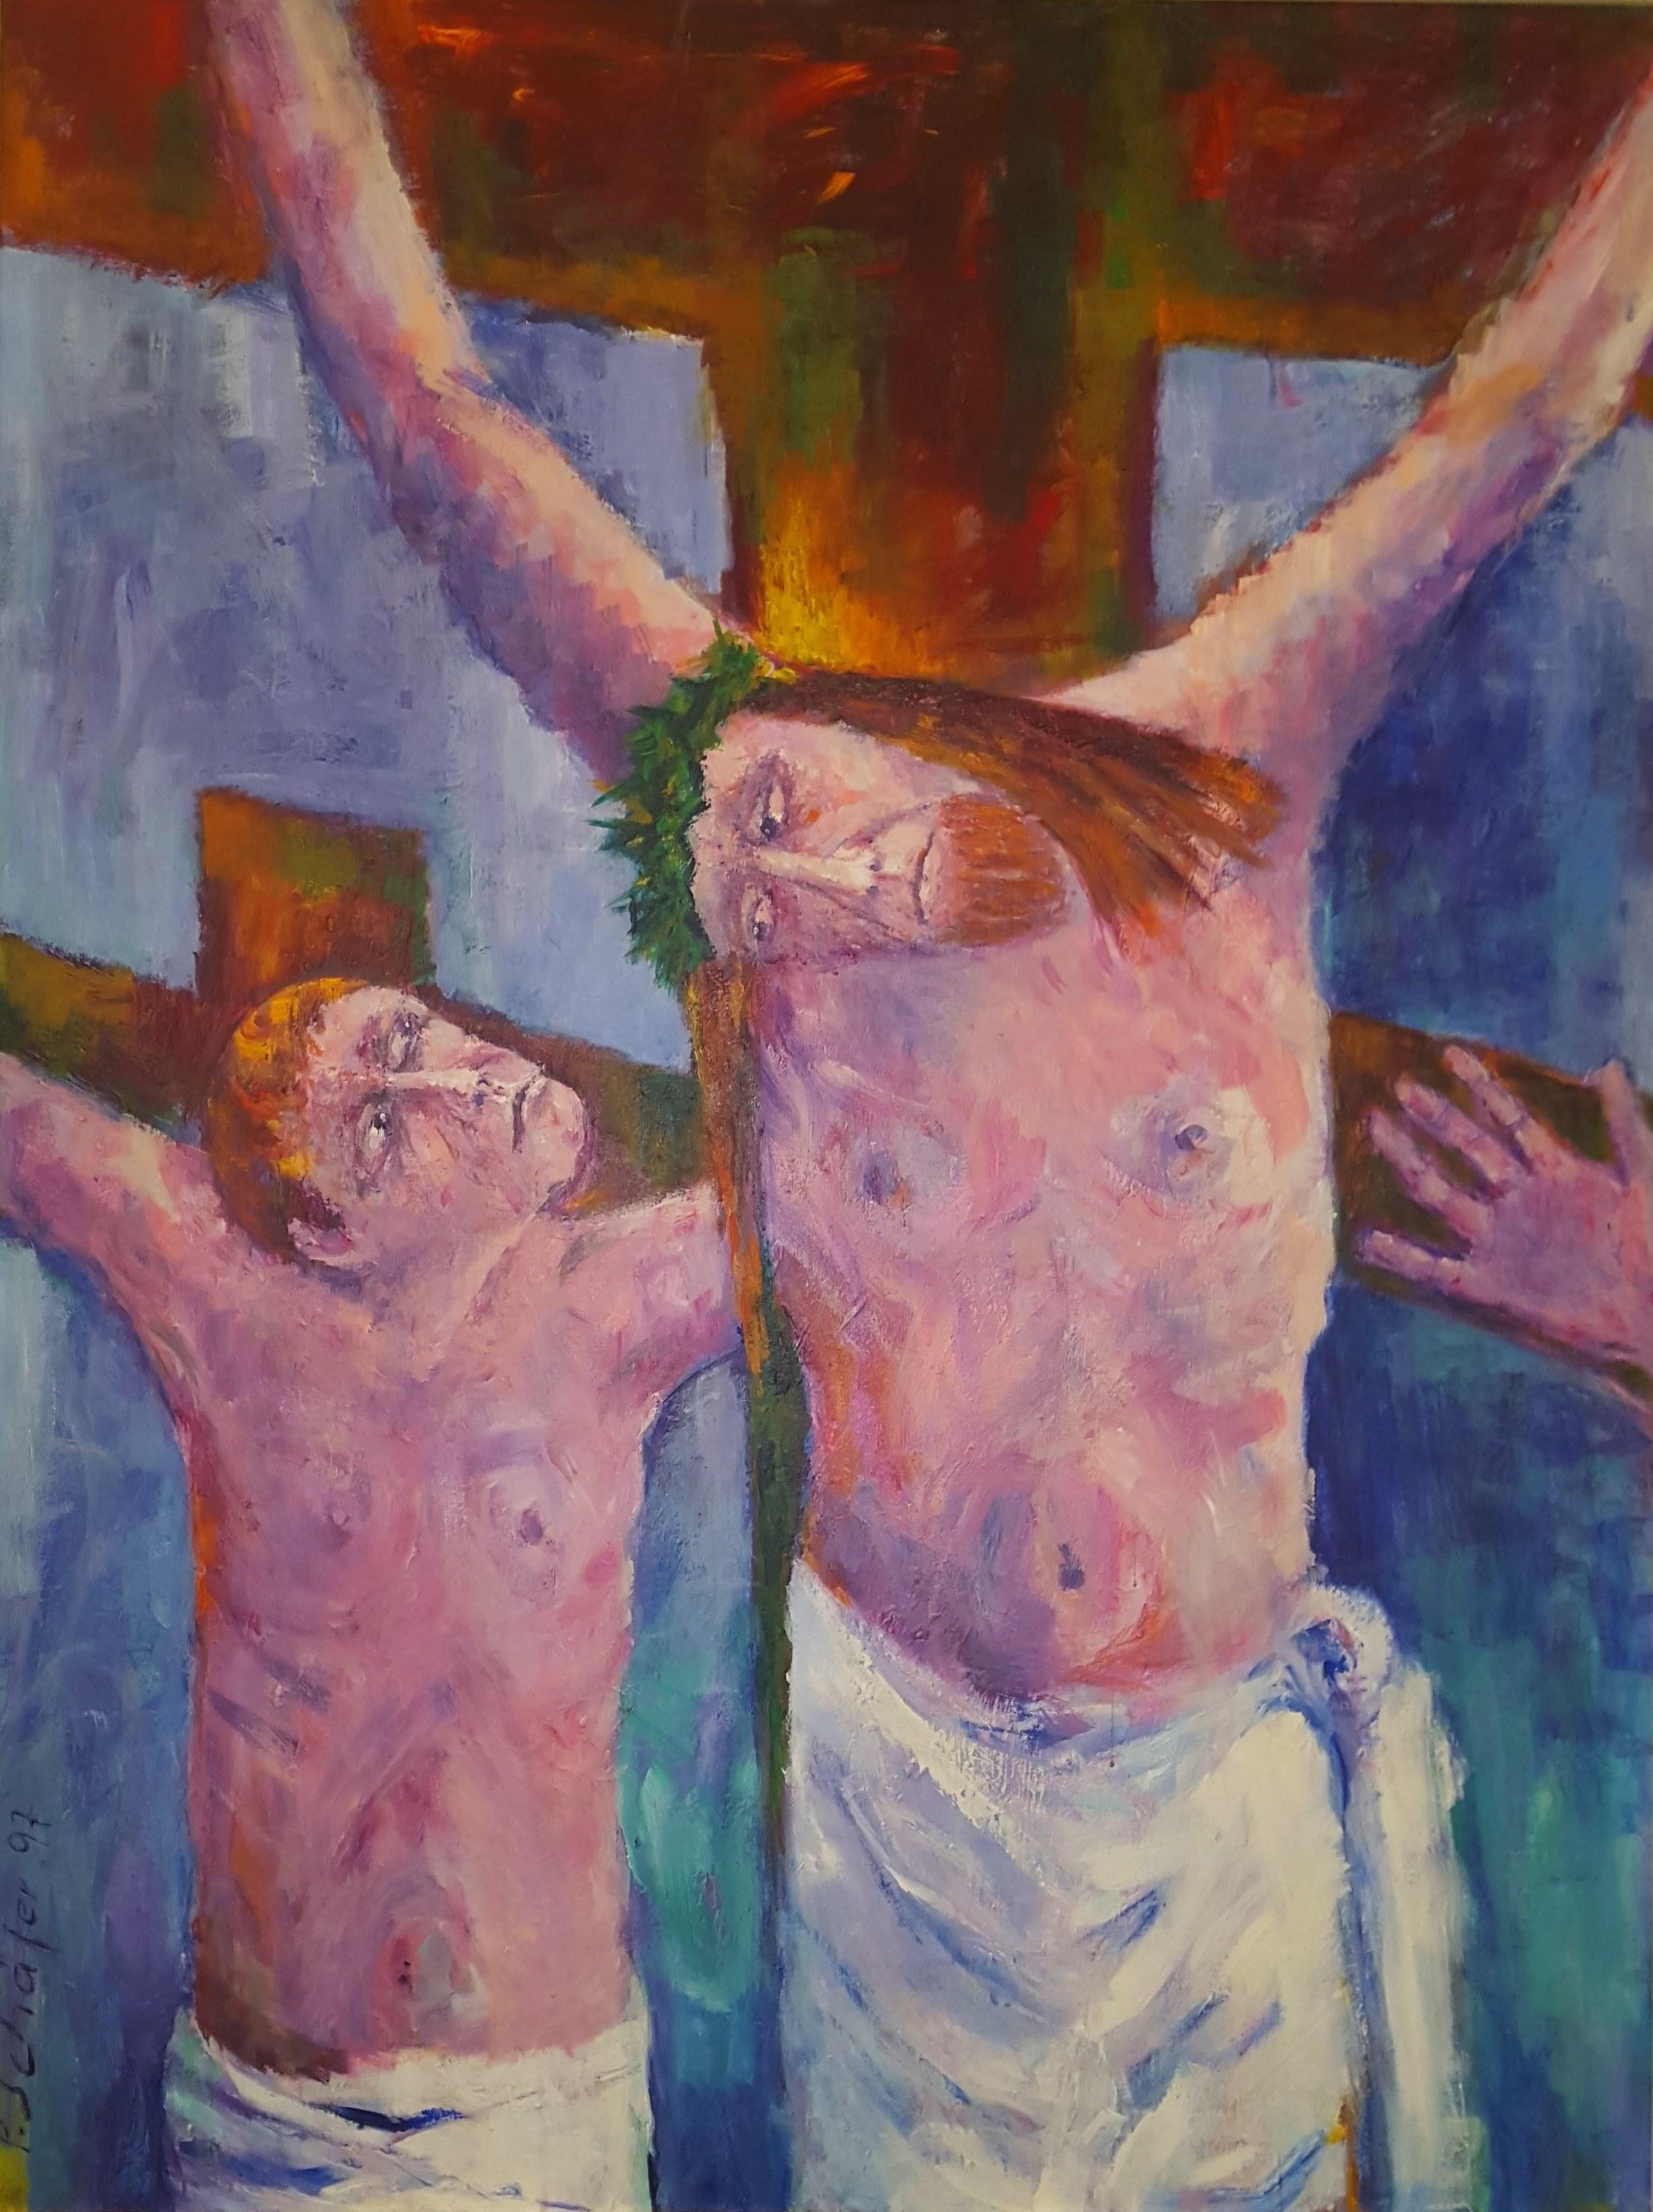 Reconciliation Room: The Penitent Thief